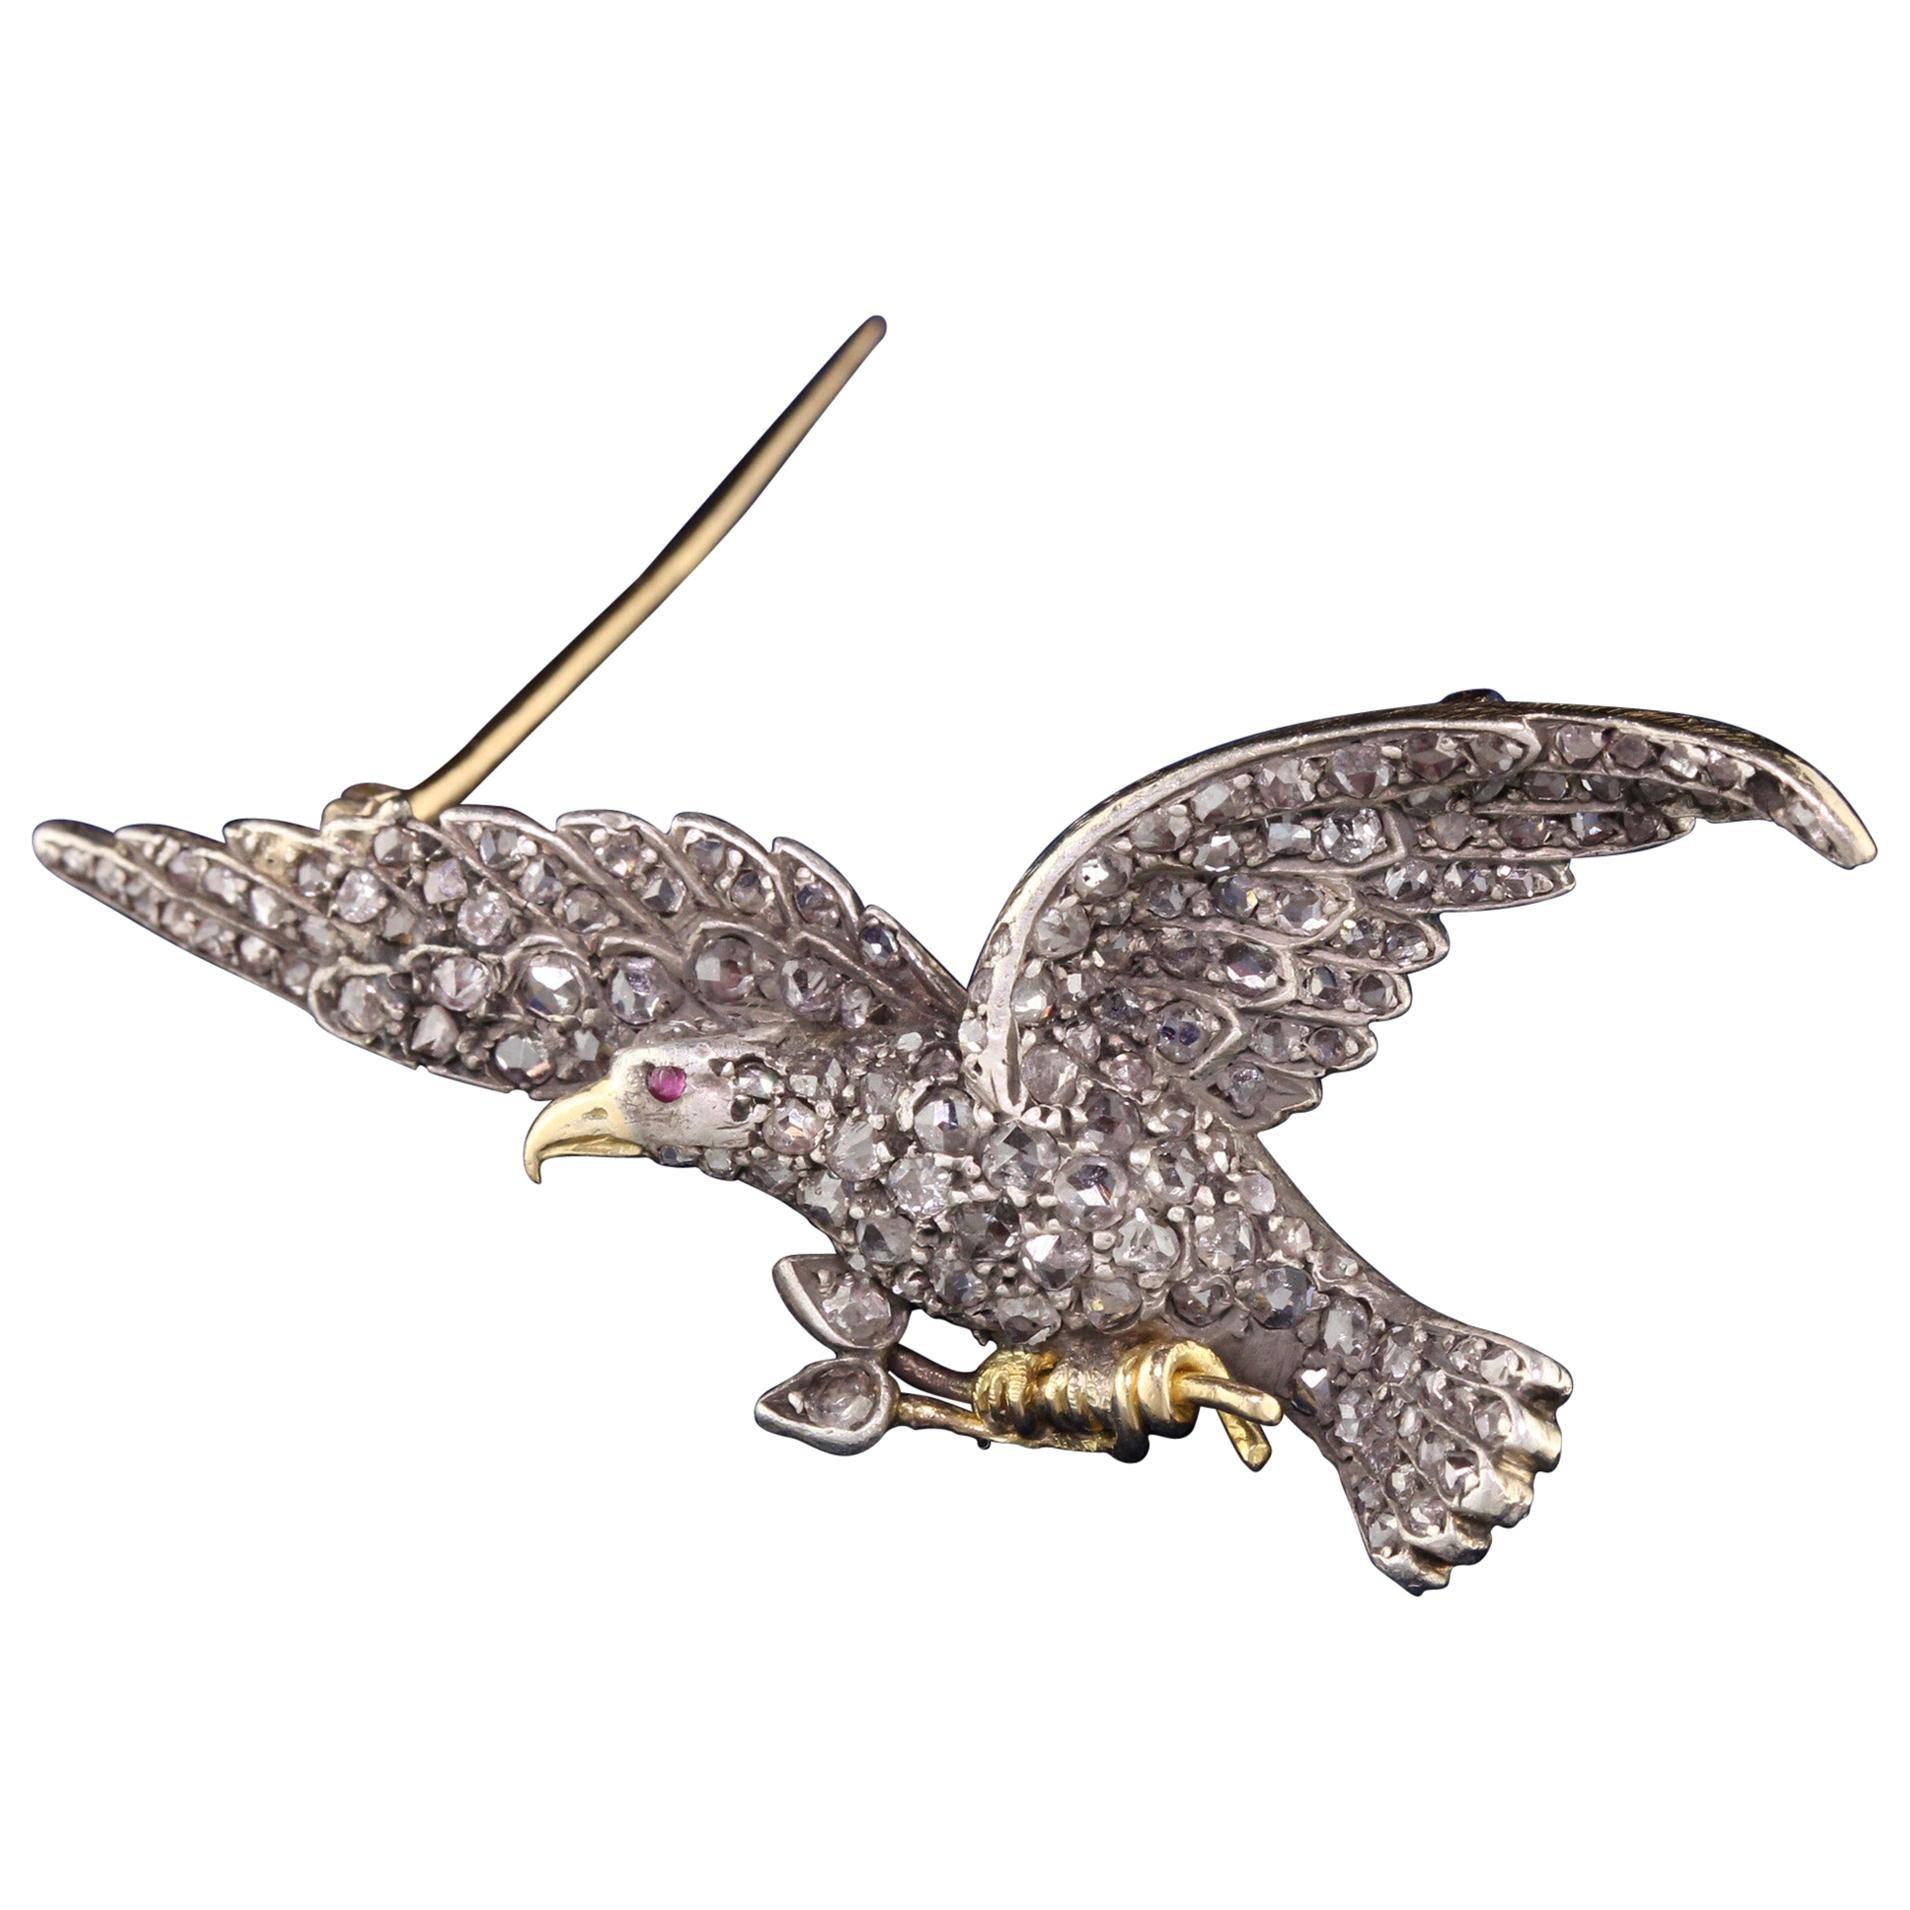 Antique Victorian 18 Karat Yellow Gold Rose Cut Diamond Eagle Pin